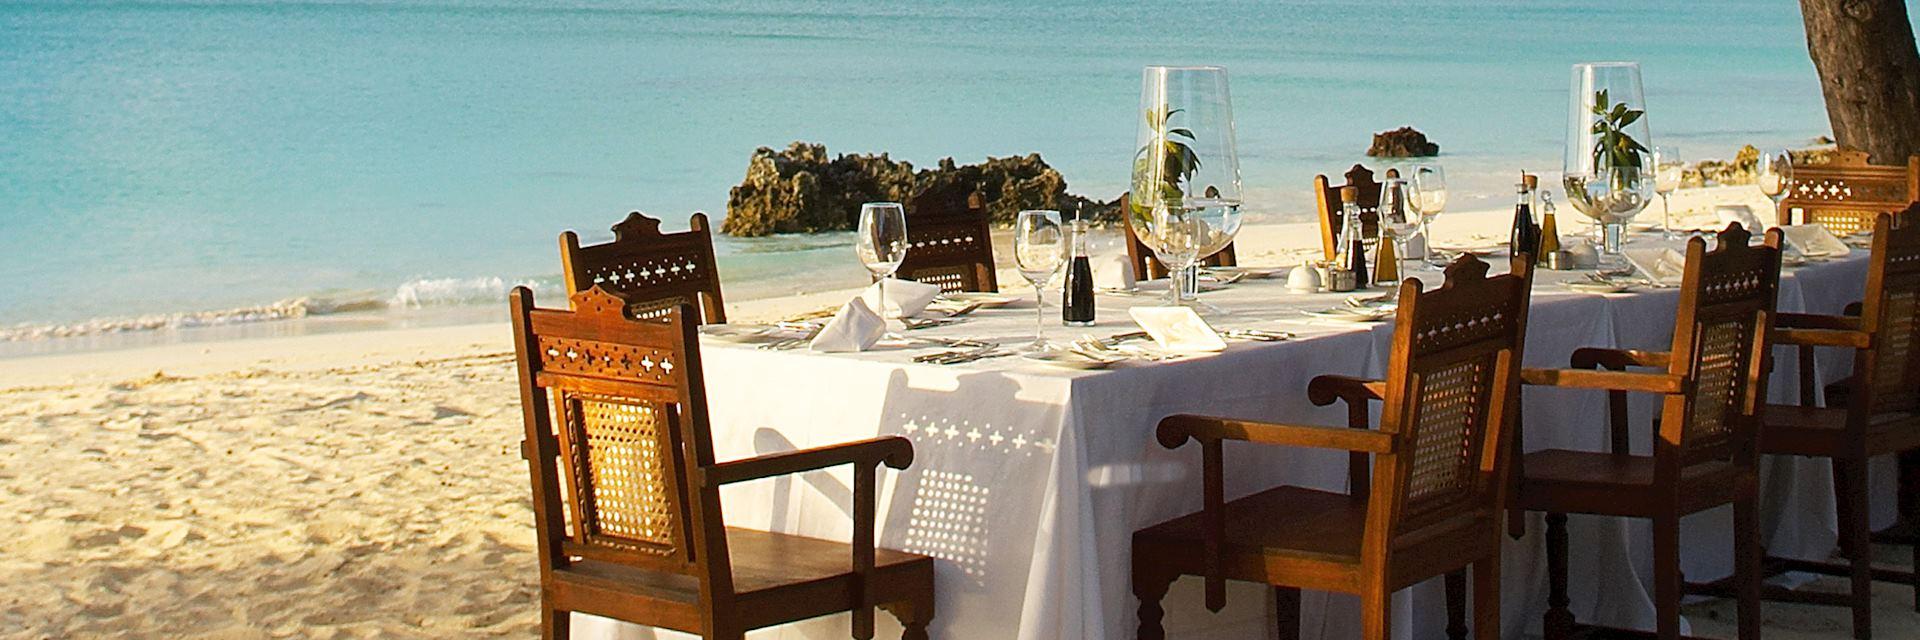 Dining on the beach at Vamizi Island, Quirimba Archipelago